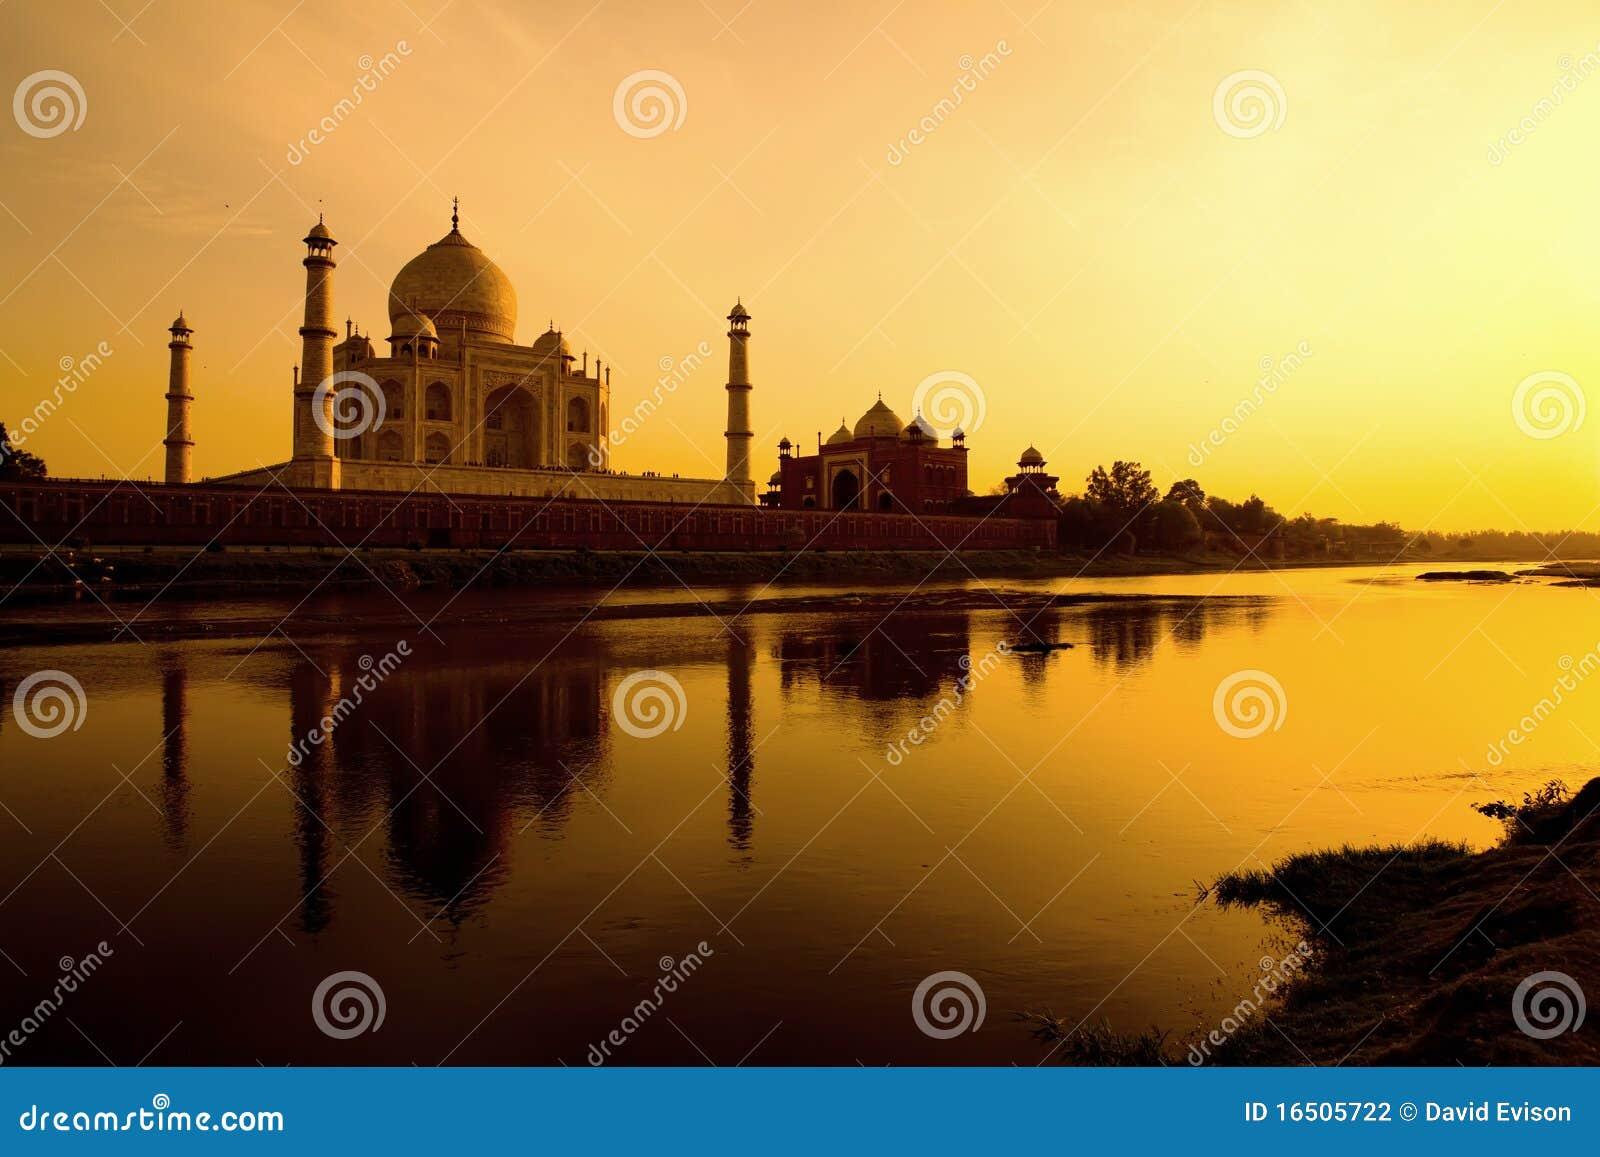 Taj Mahal en la puesta del sol.